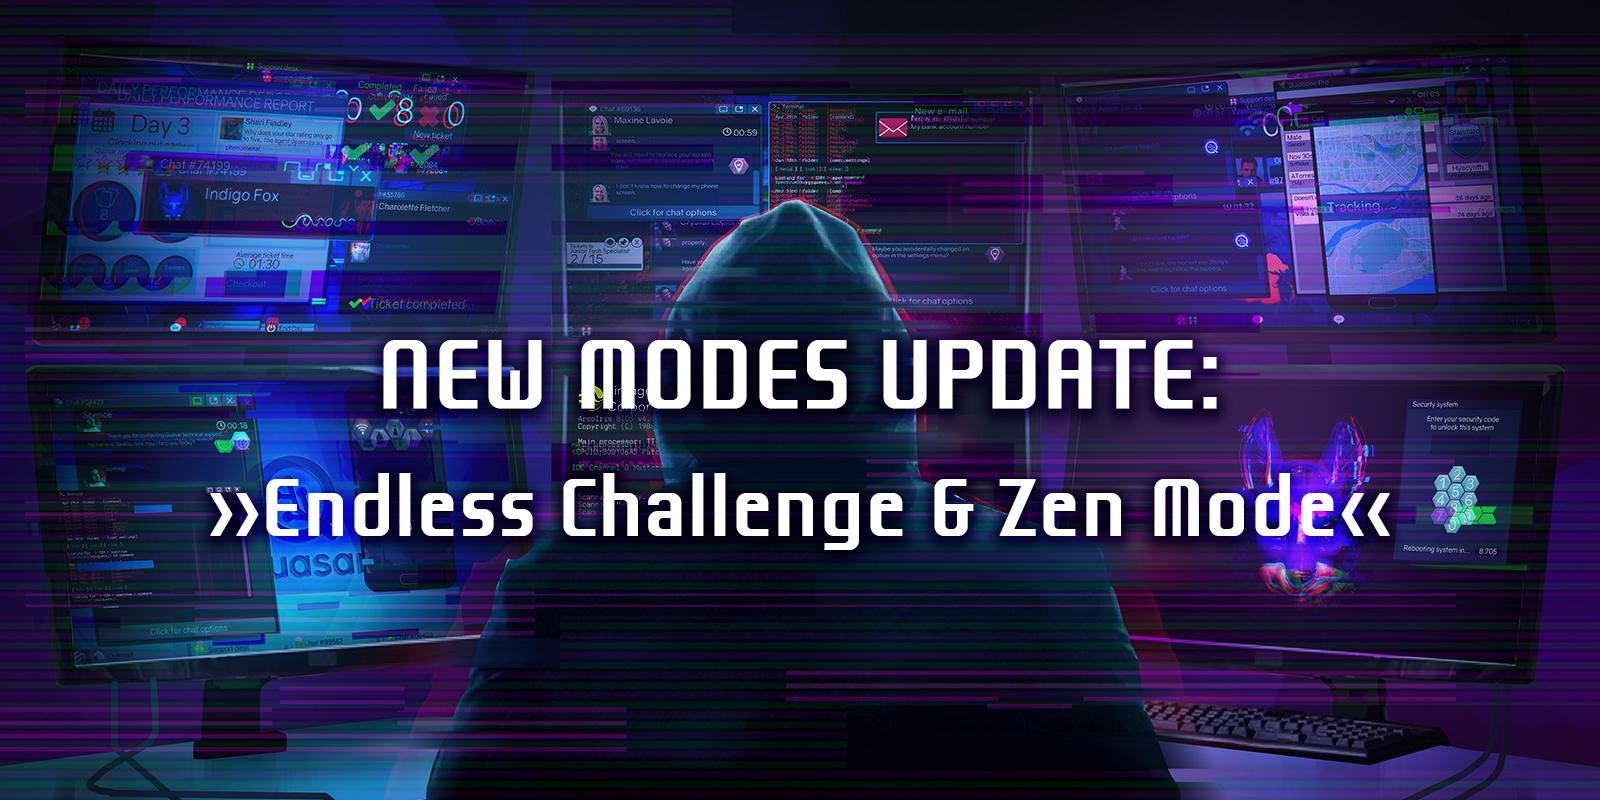 New Modes Update: Endless Challenge & Zen Mode